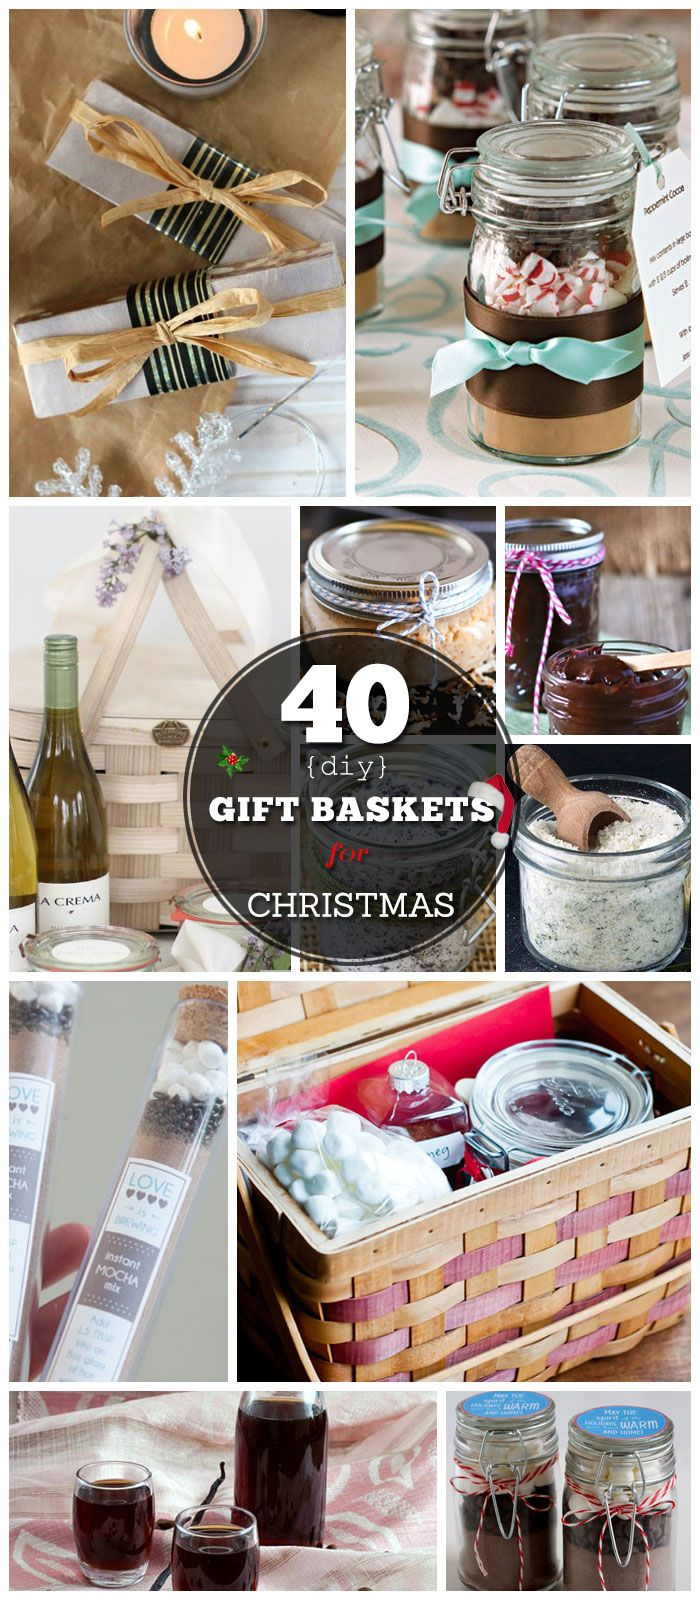 26 DIY Gift Basket Ideas for Christmas   DIY gift ideas   Pinterest ...